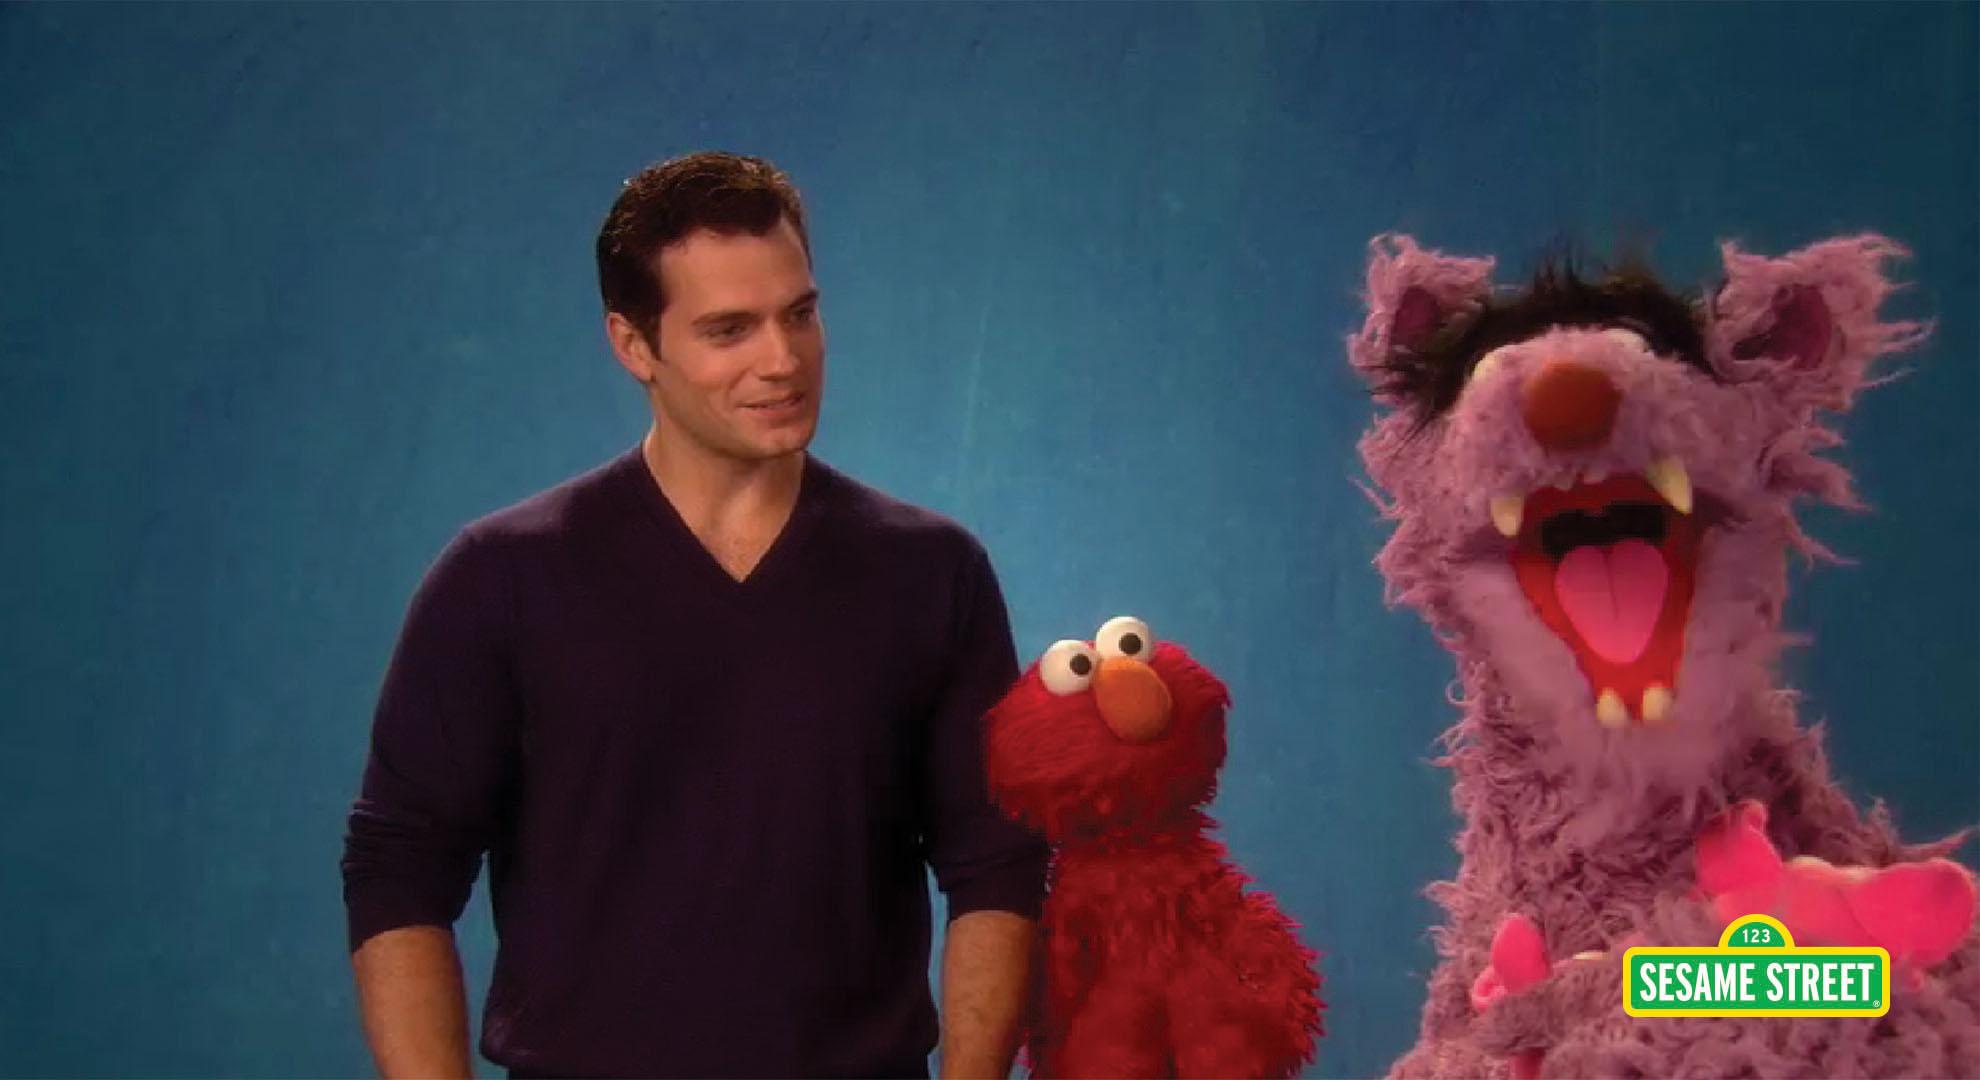 Henry Cavill: Respect | Sesame Street